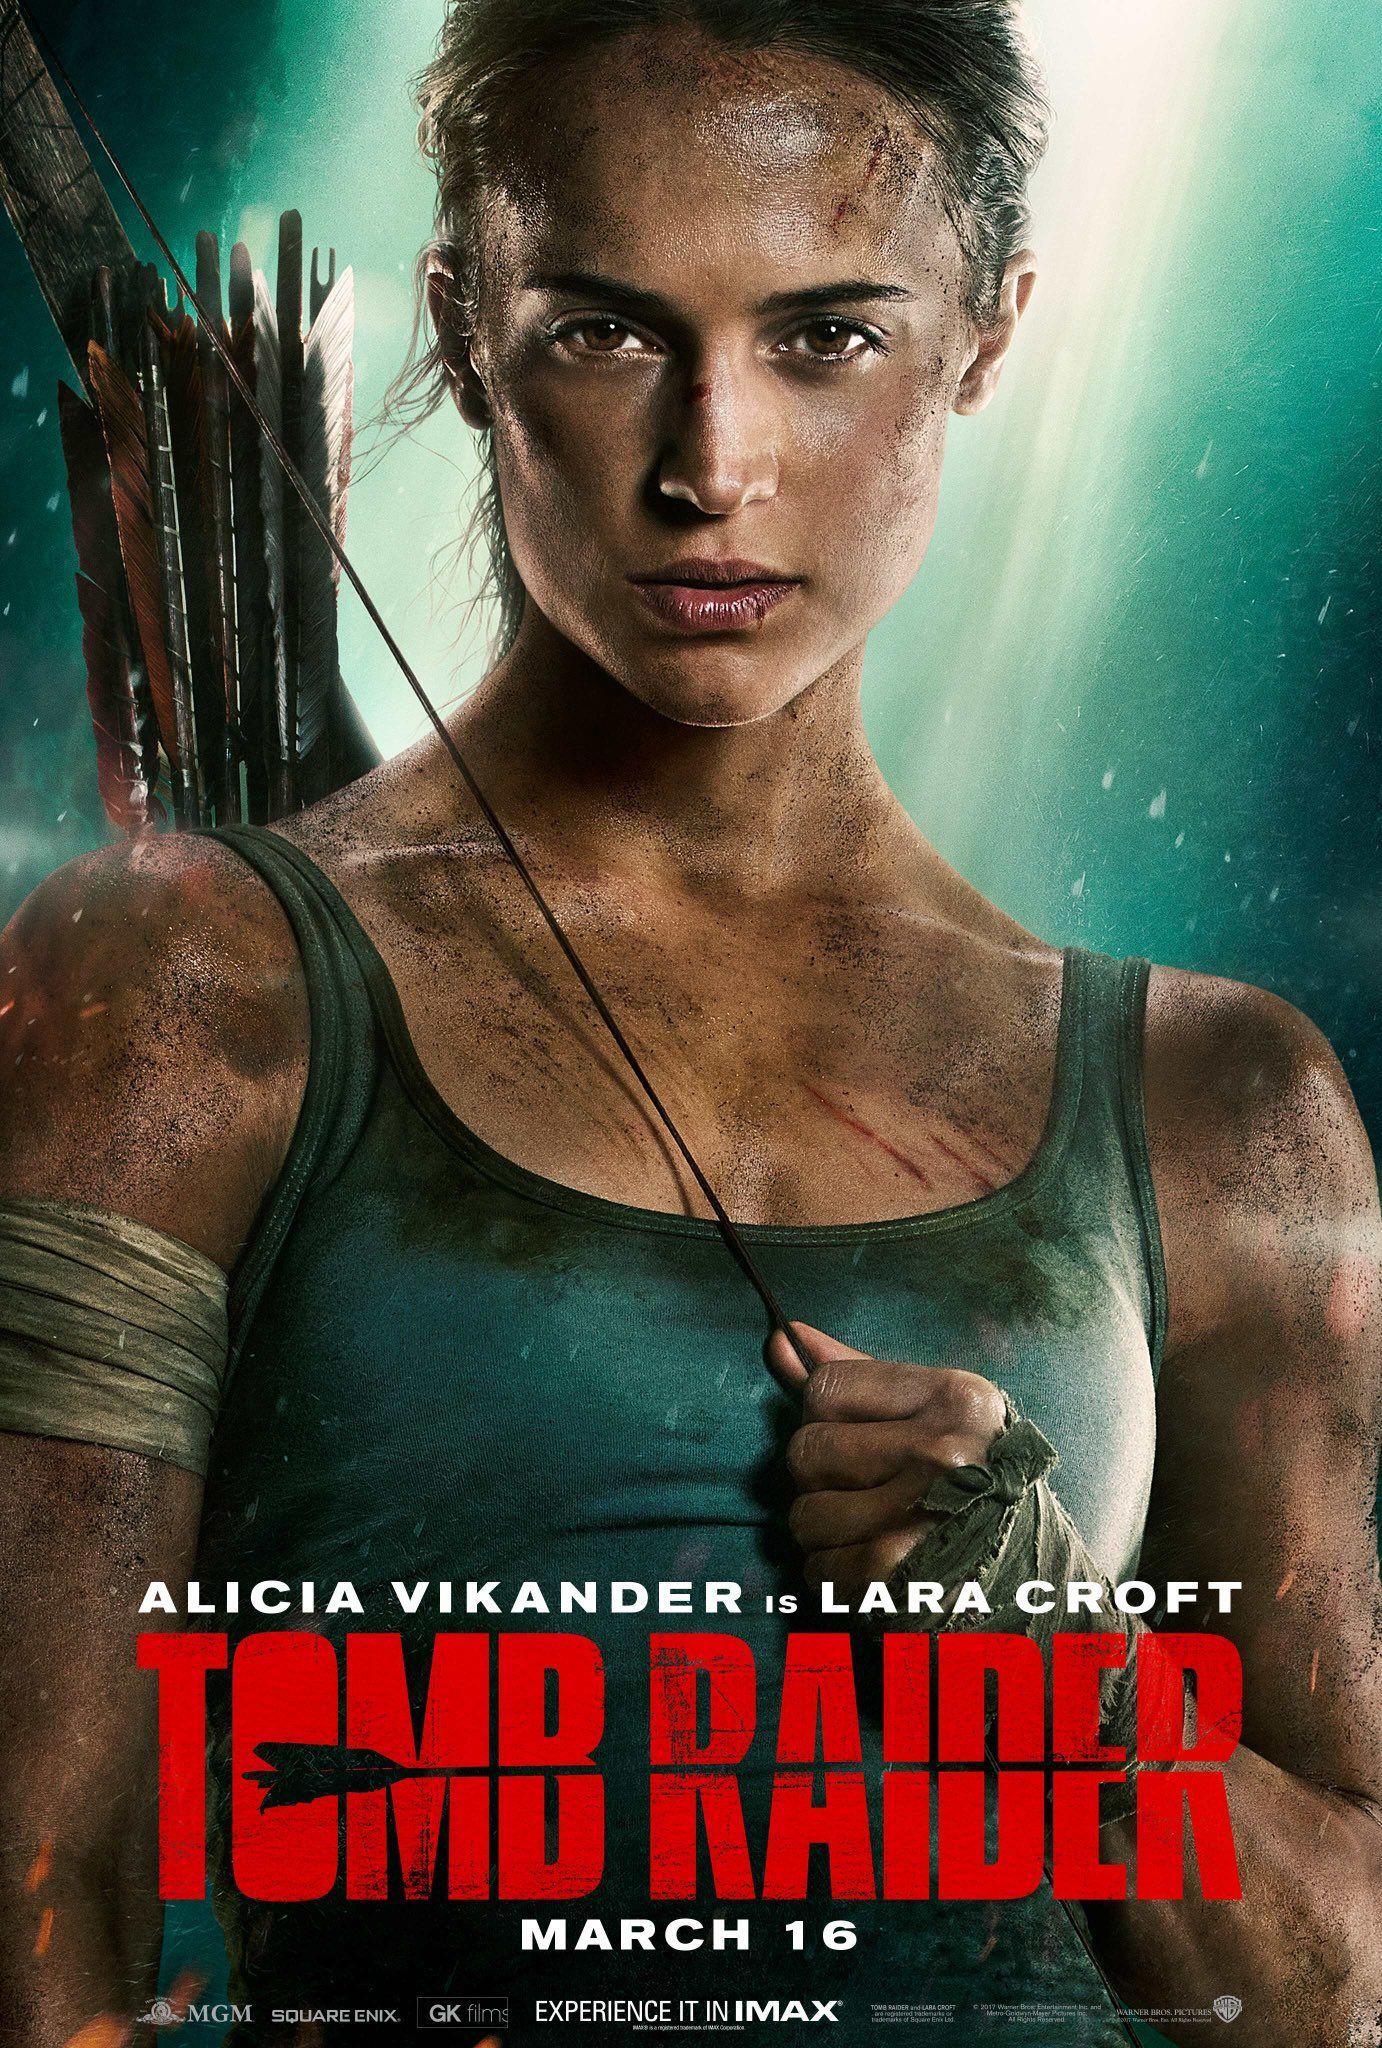 tomb raider movie new poster features alicia vikander